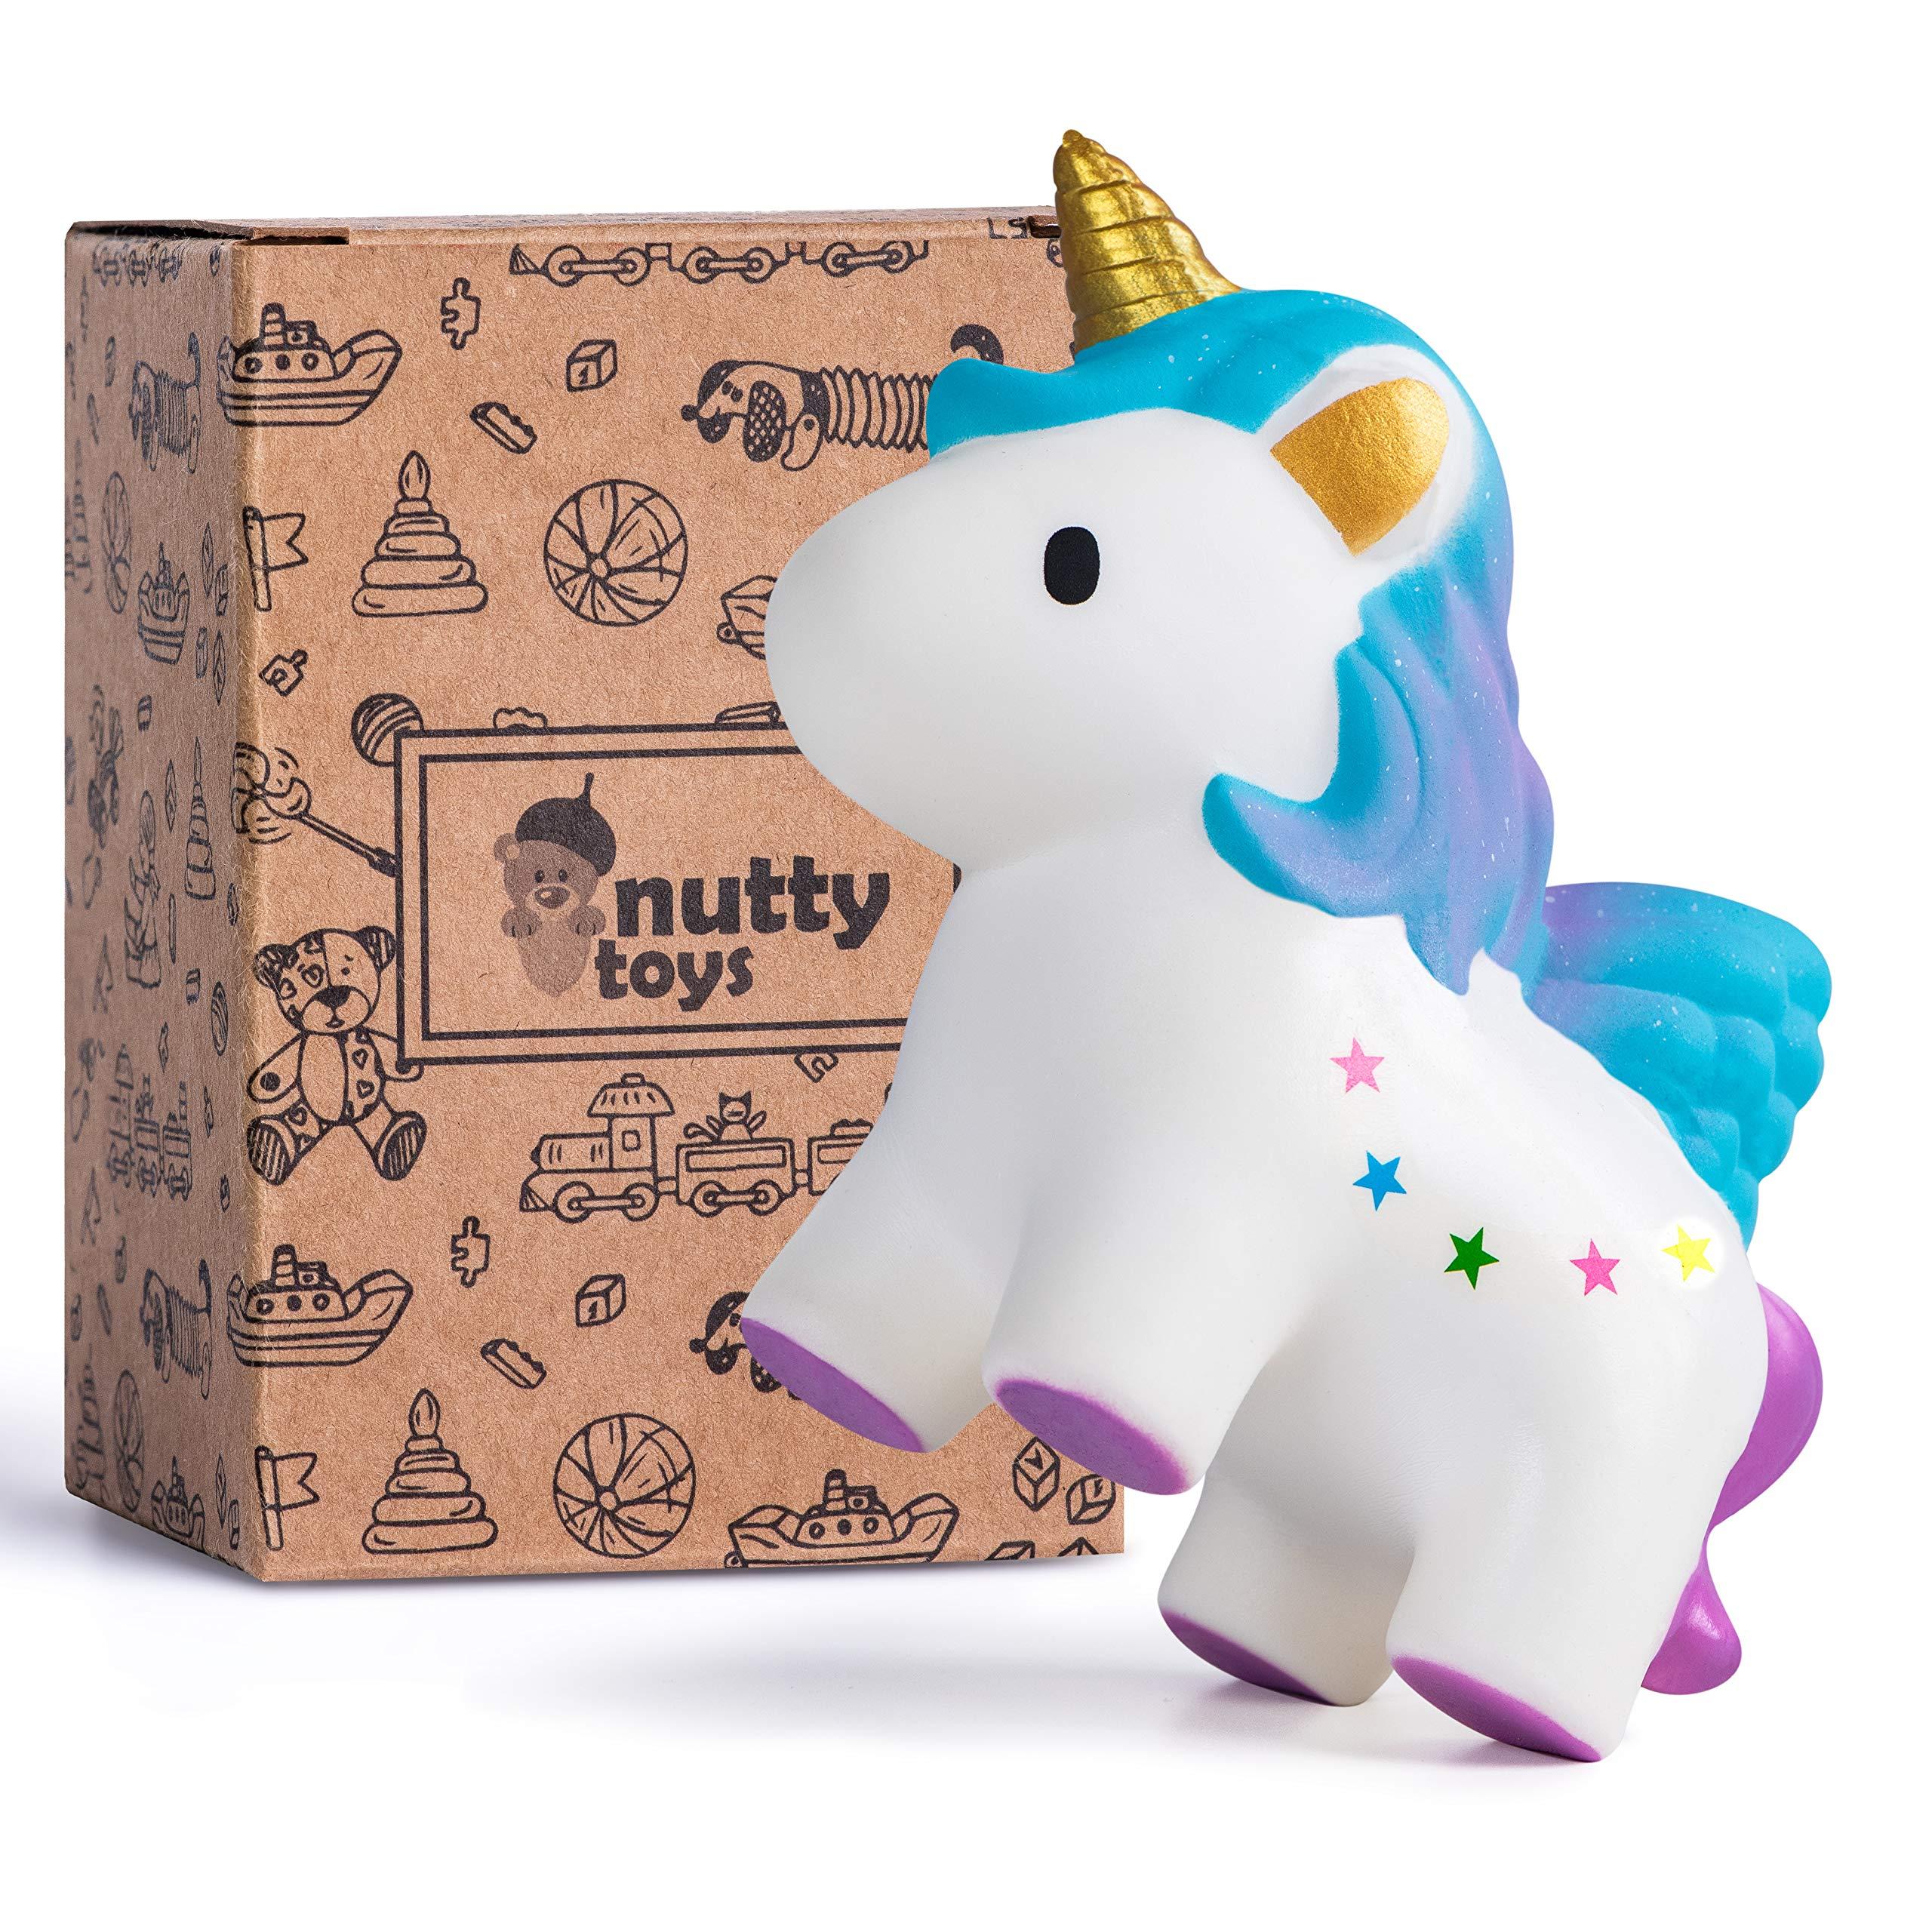 NUTTY TOYS Rising Squishy Unicorn